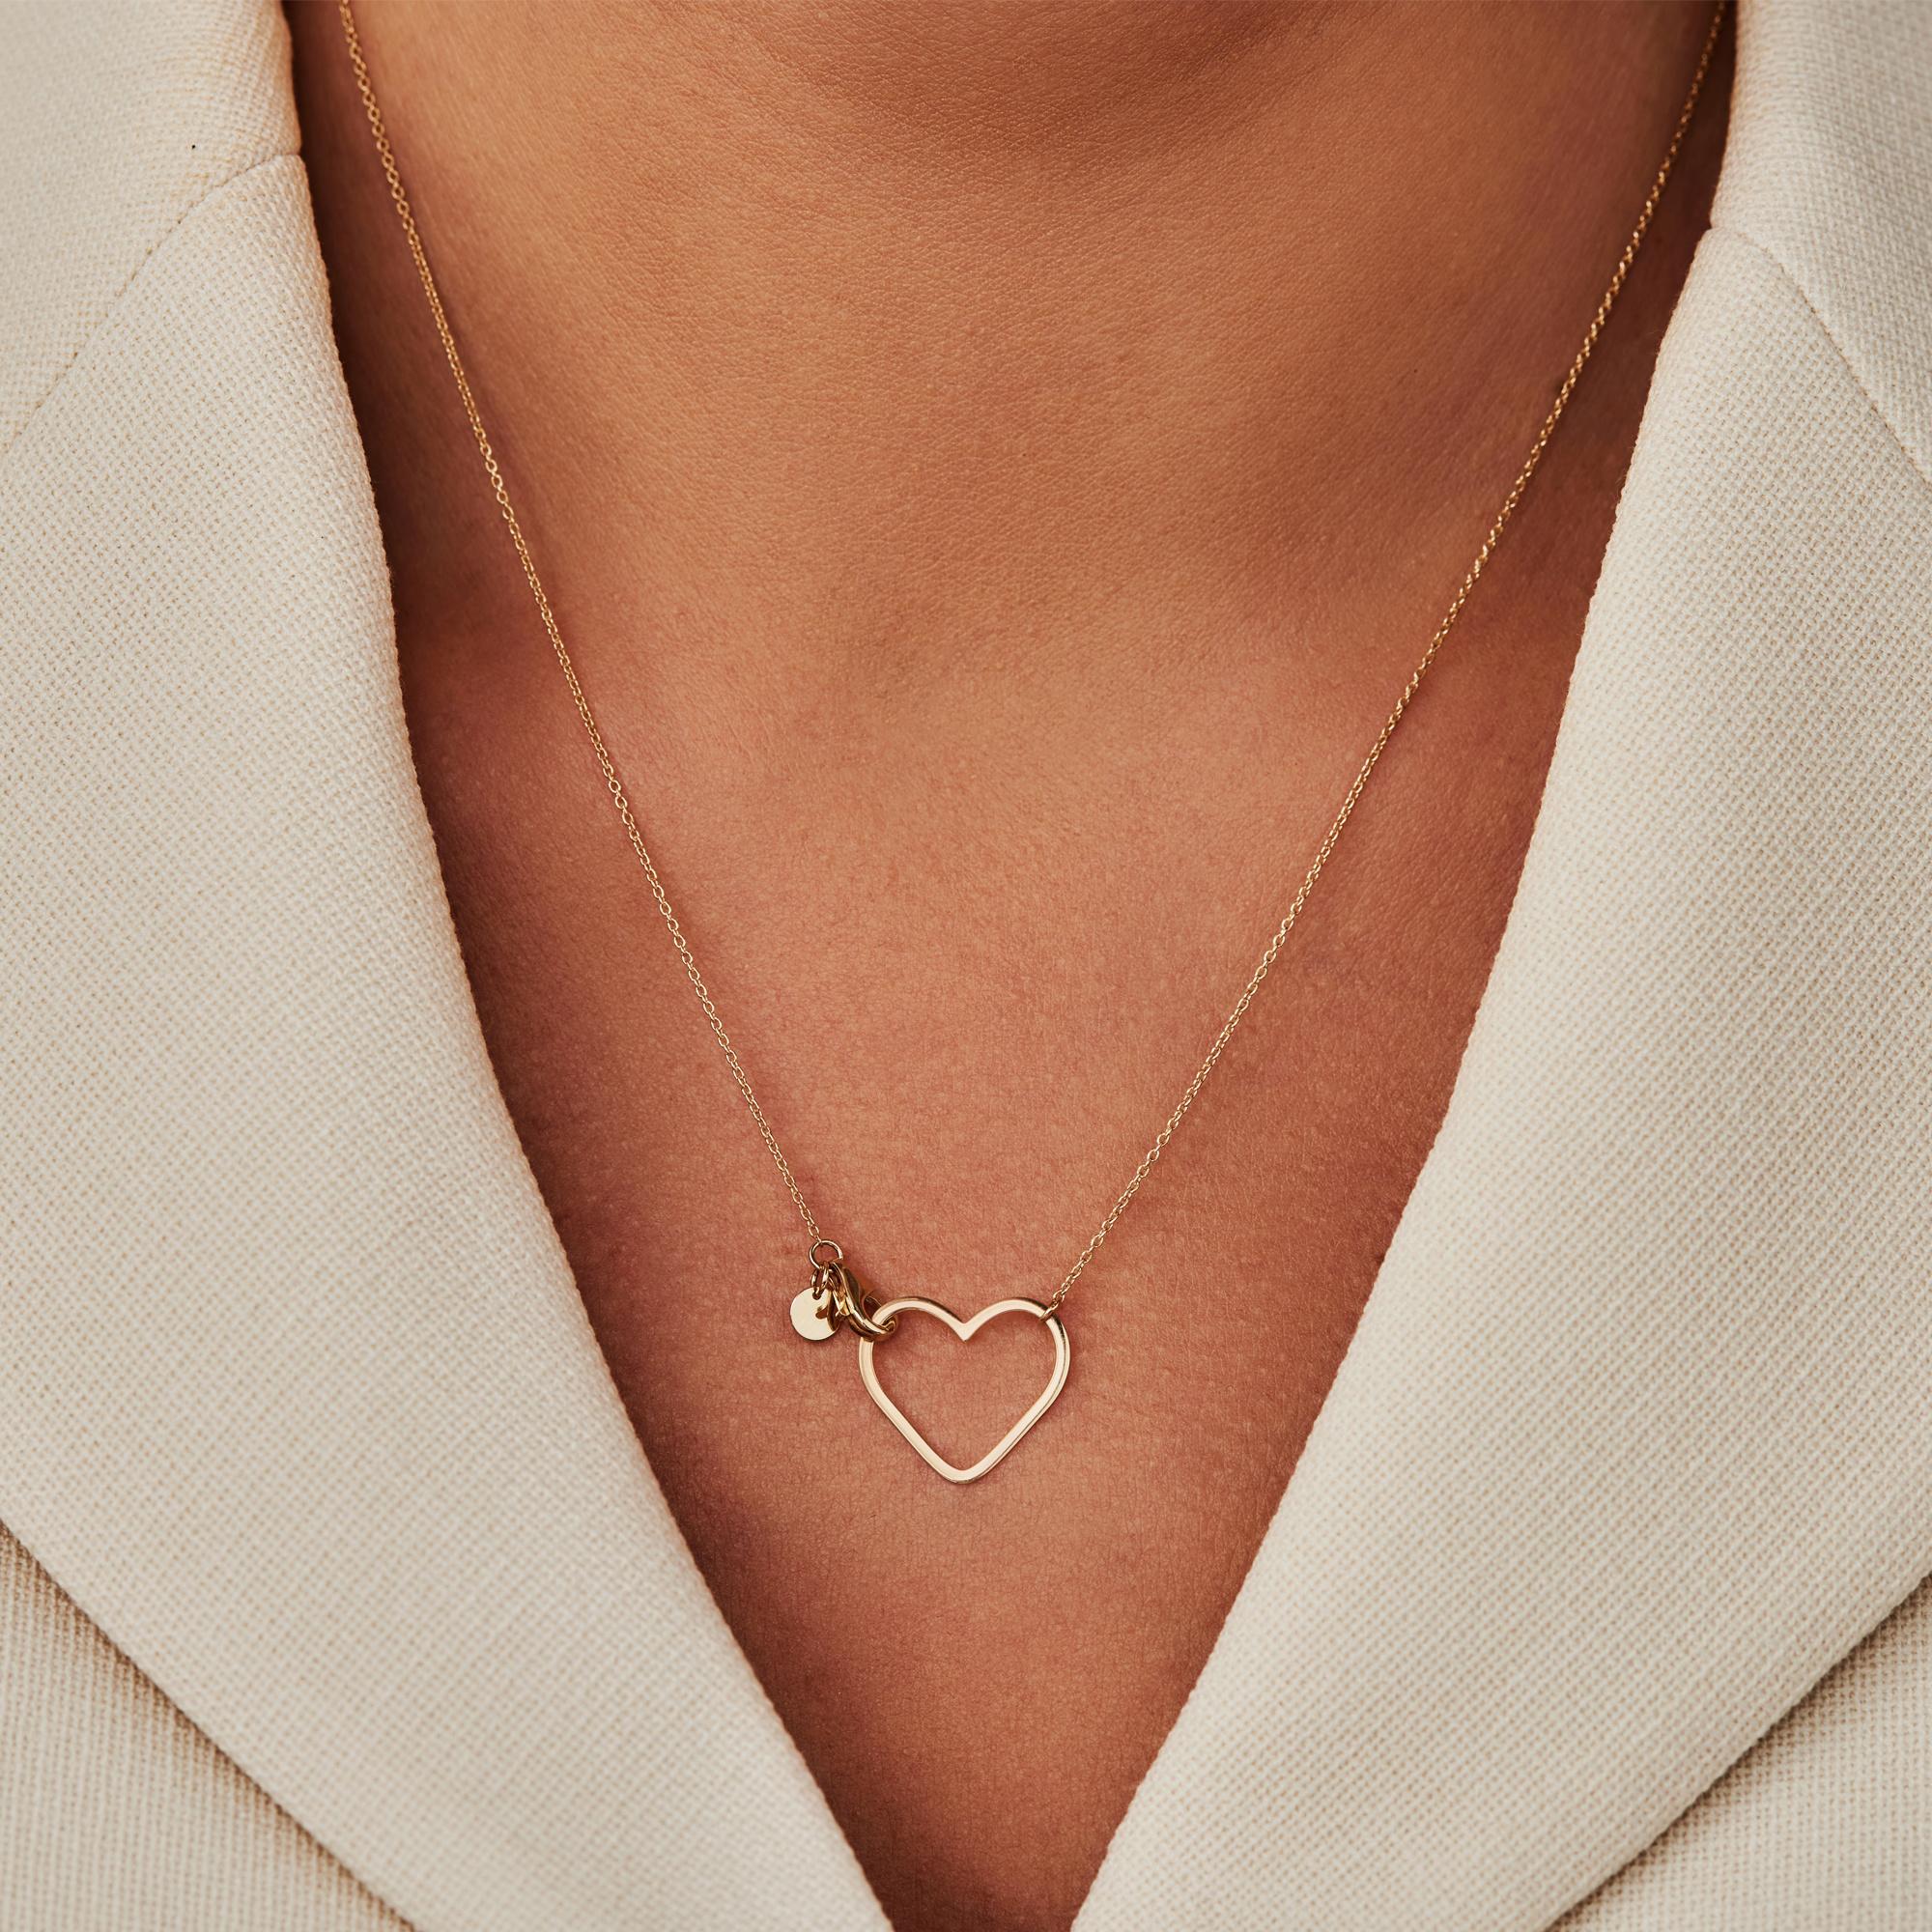 Isabel Bernard Belleville Amore collier en or 14 carats avec le coeur